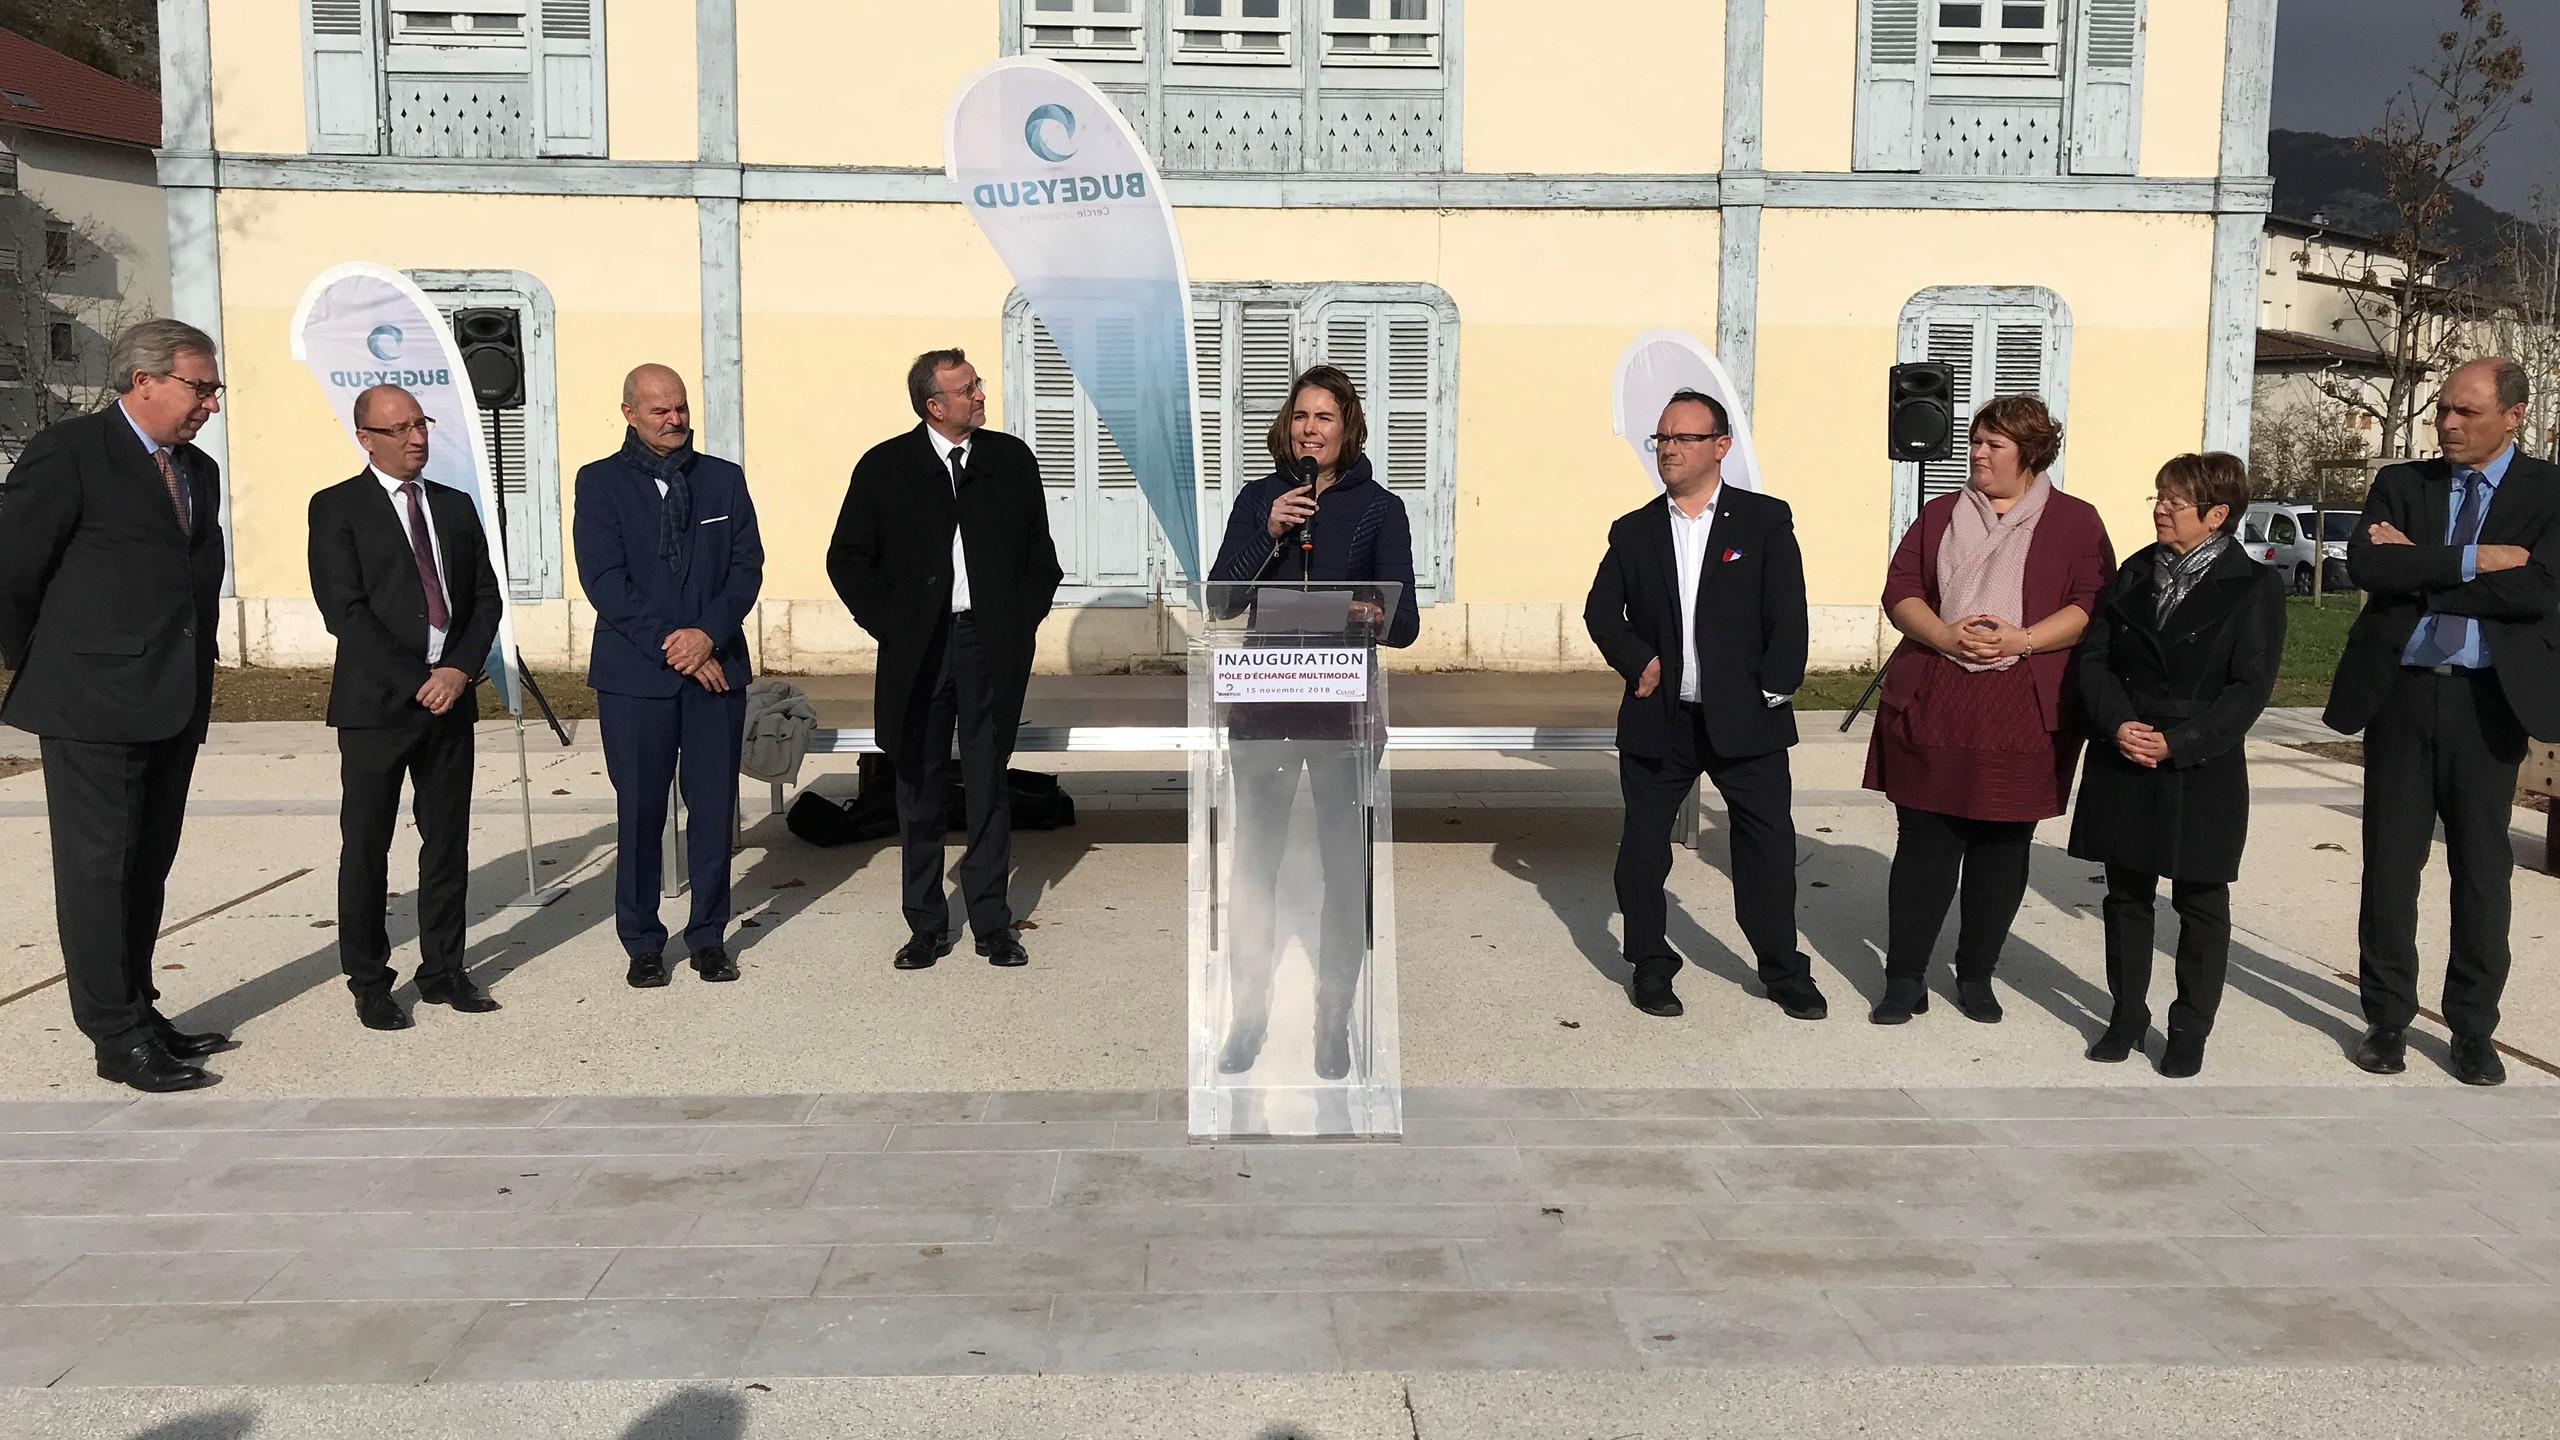 Inauguration pôle multimodal, Culoz